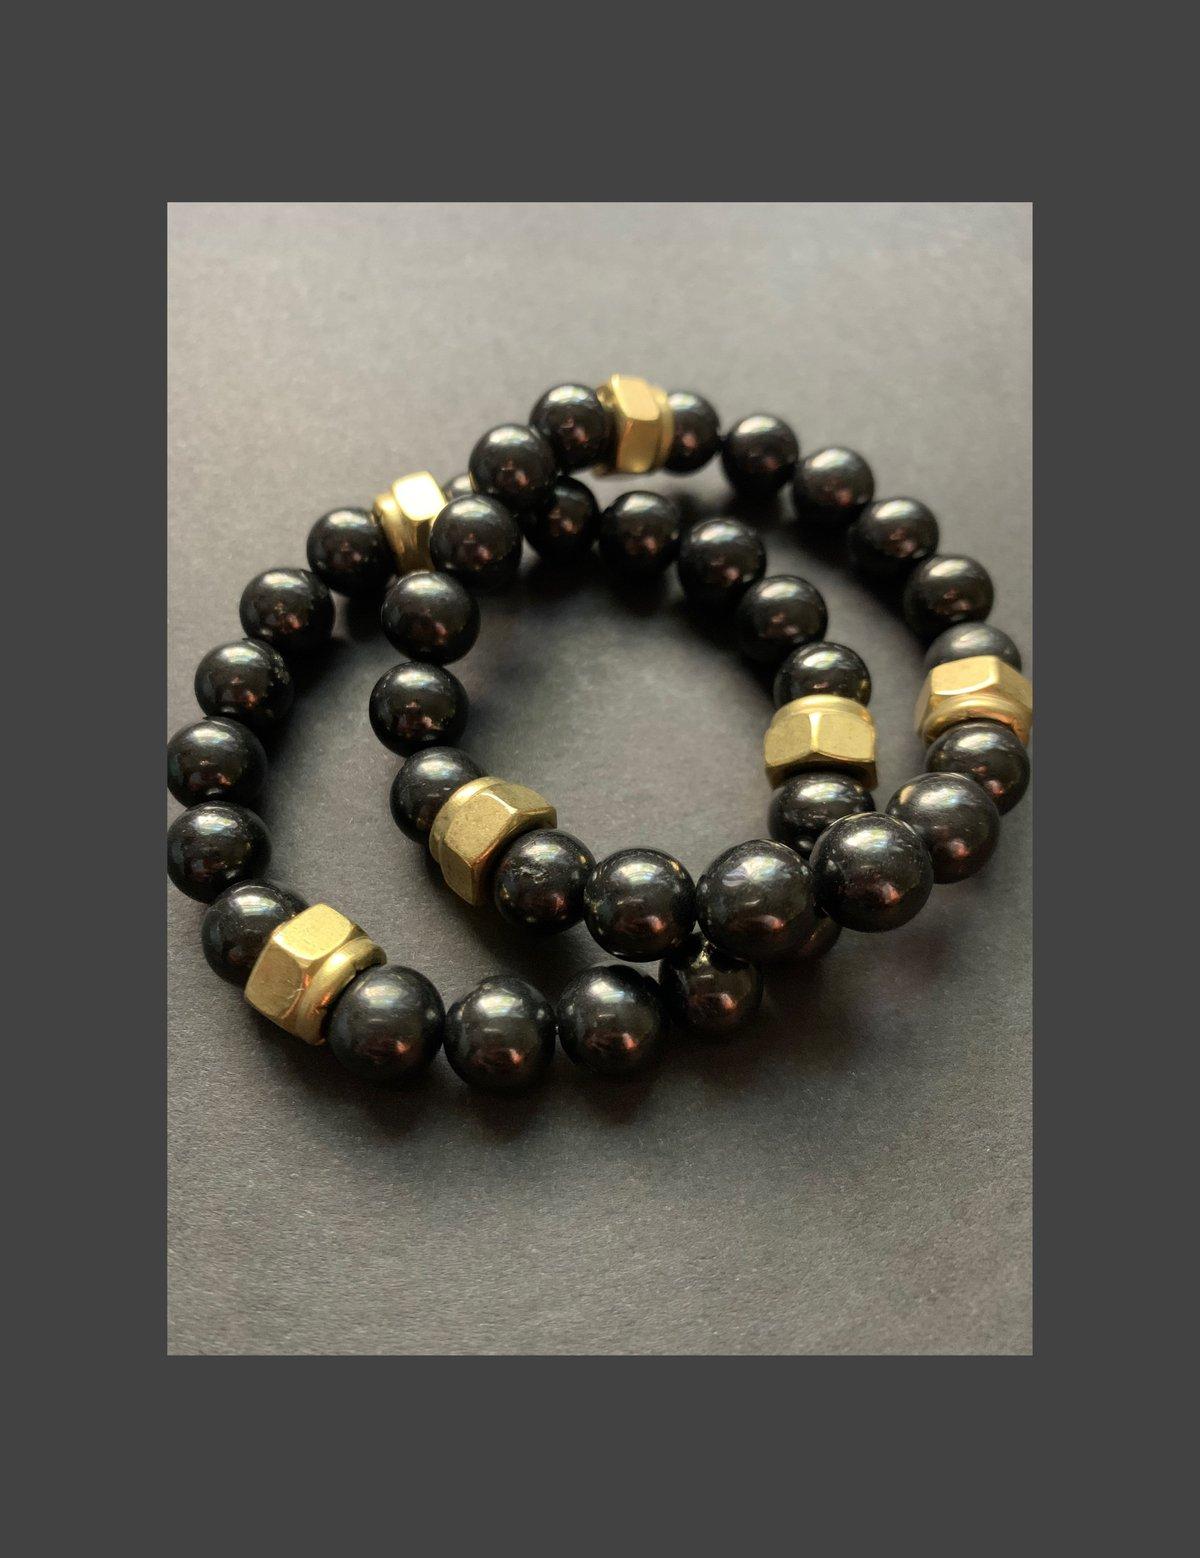 Men's Shungite Bracelet w/ Brass Accents